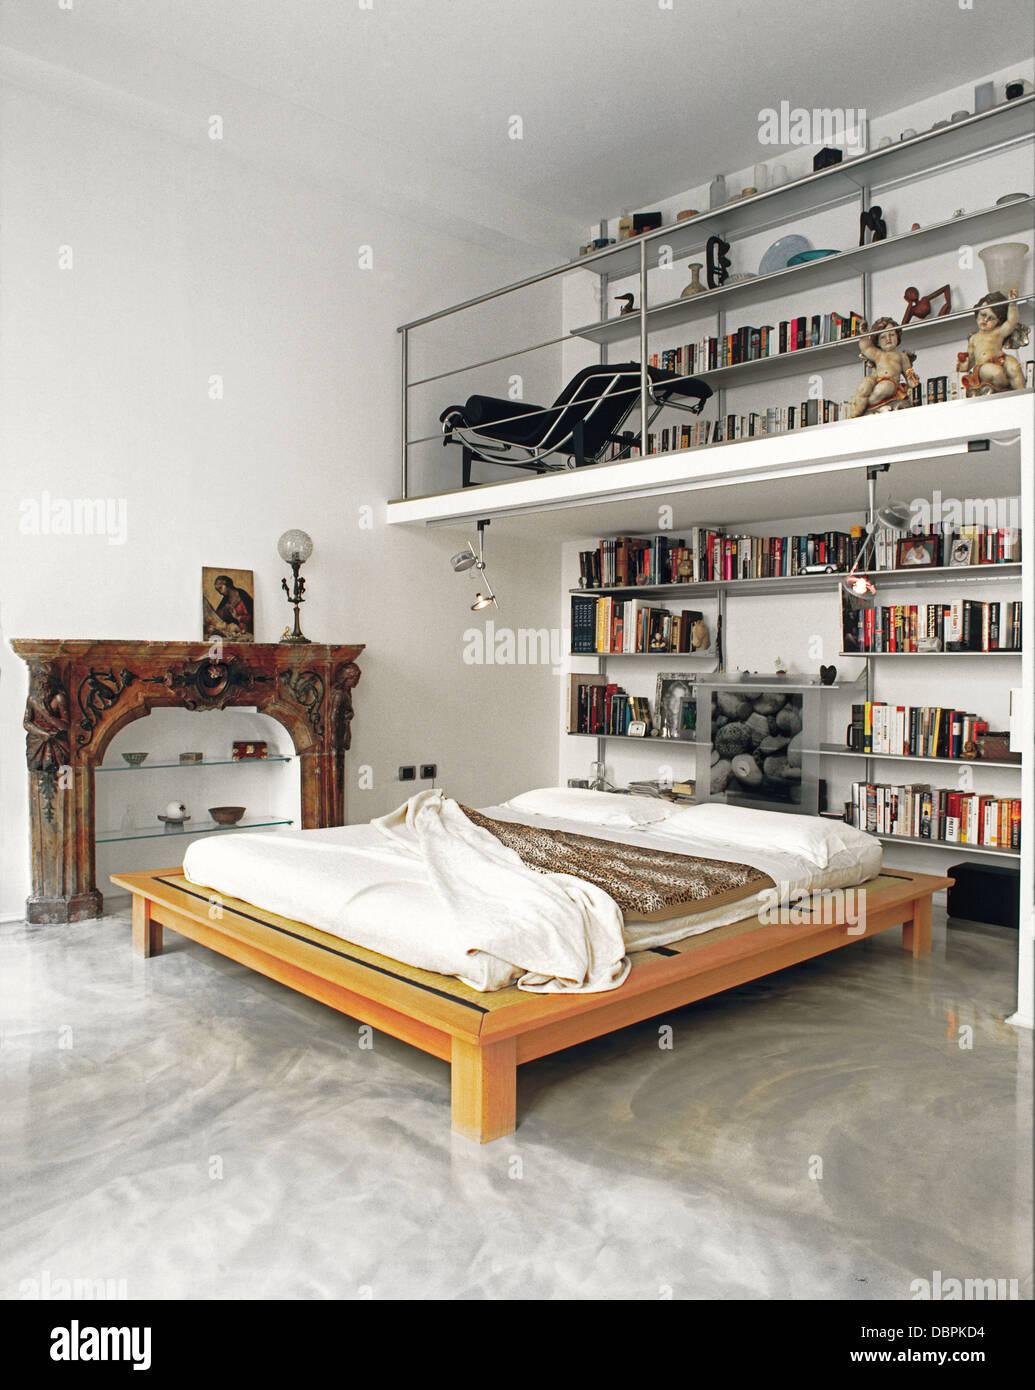 Mezzanine bedroom stock photos mezzanine bedroom stock for How to build a mezzanine floor for bedroom